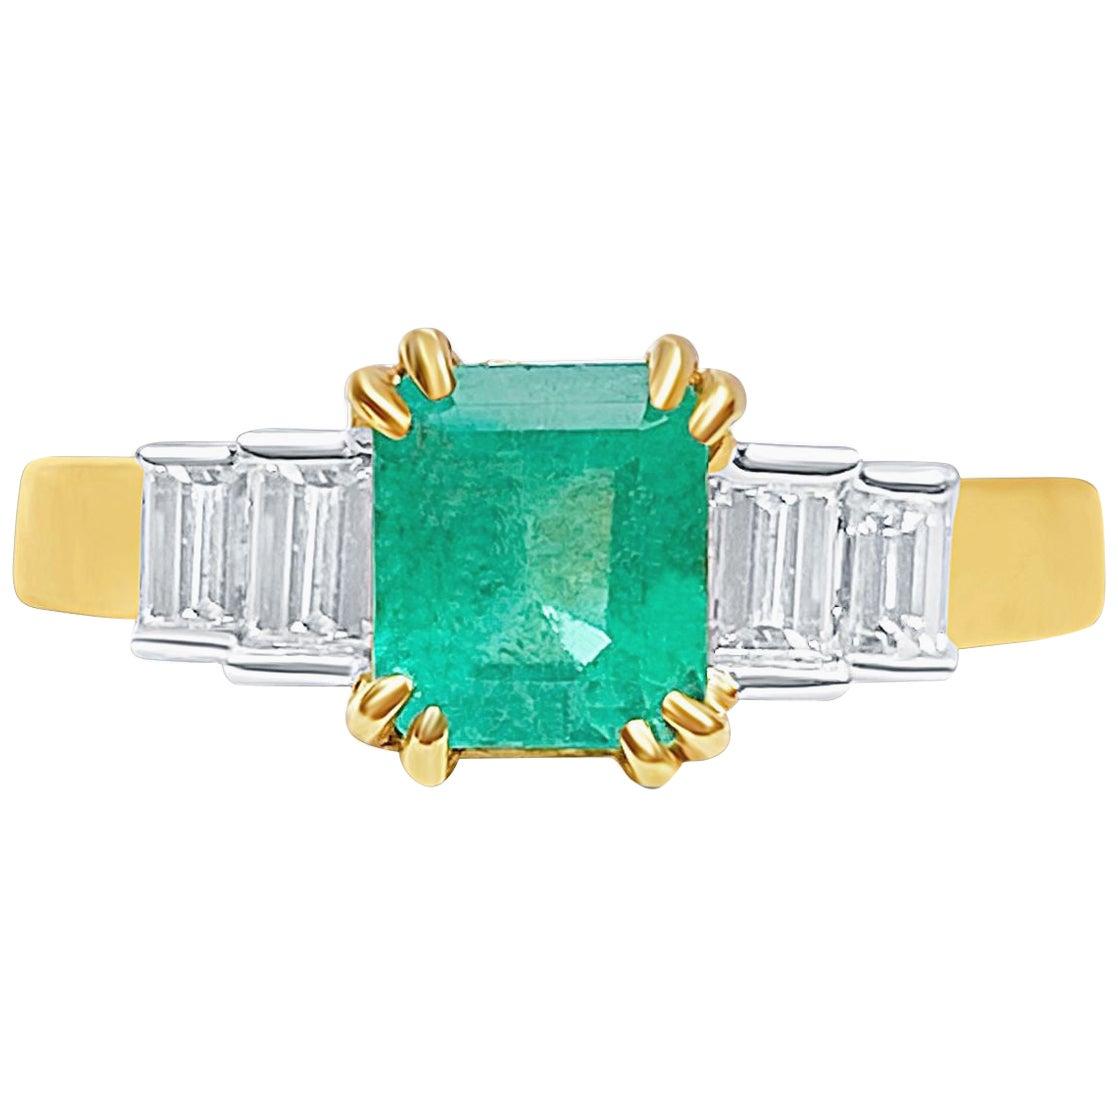 1.27 Carat Emerald-Cut Colombian Emerald and Diamond 18 Karat Yellow Gold Ring